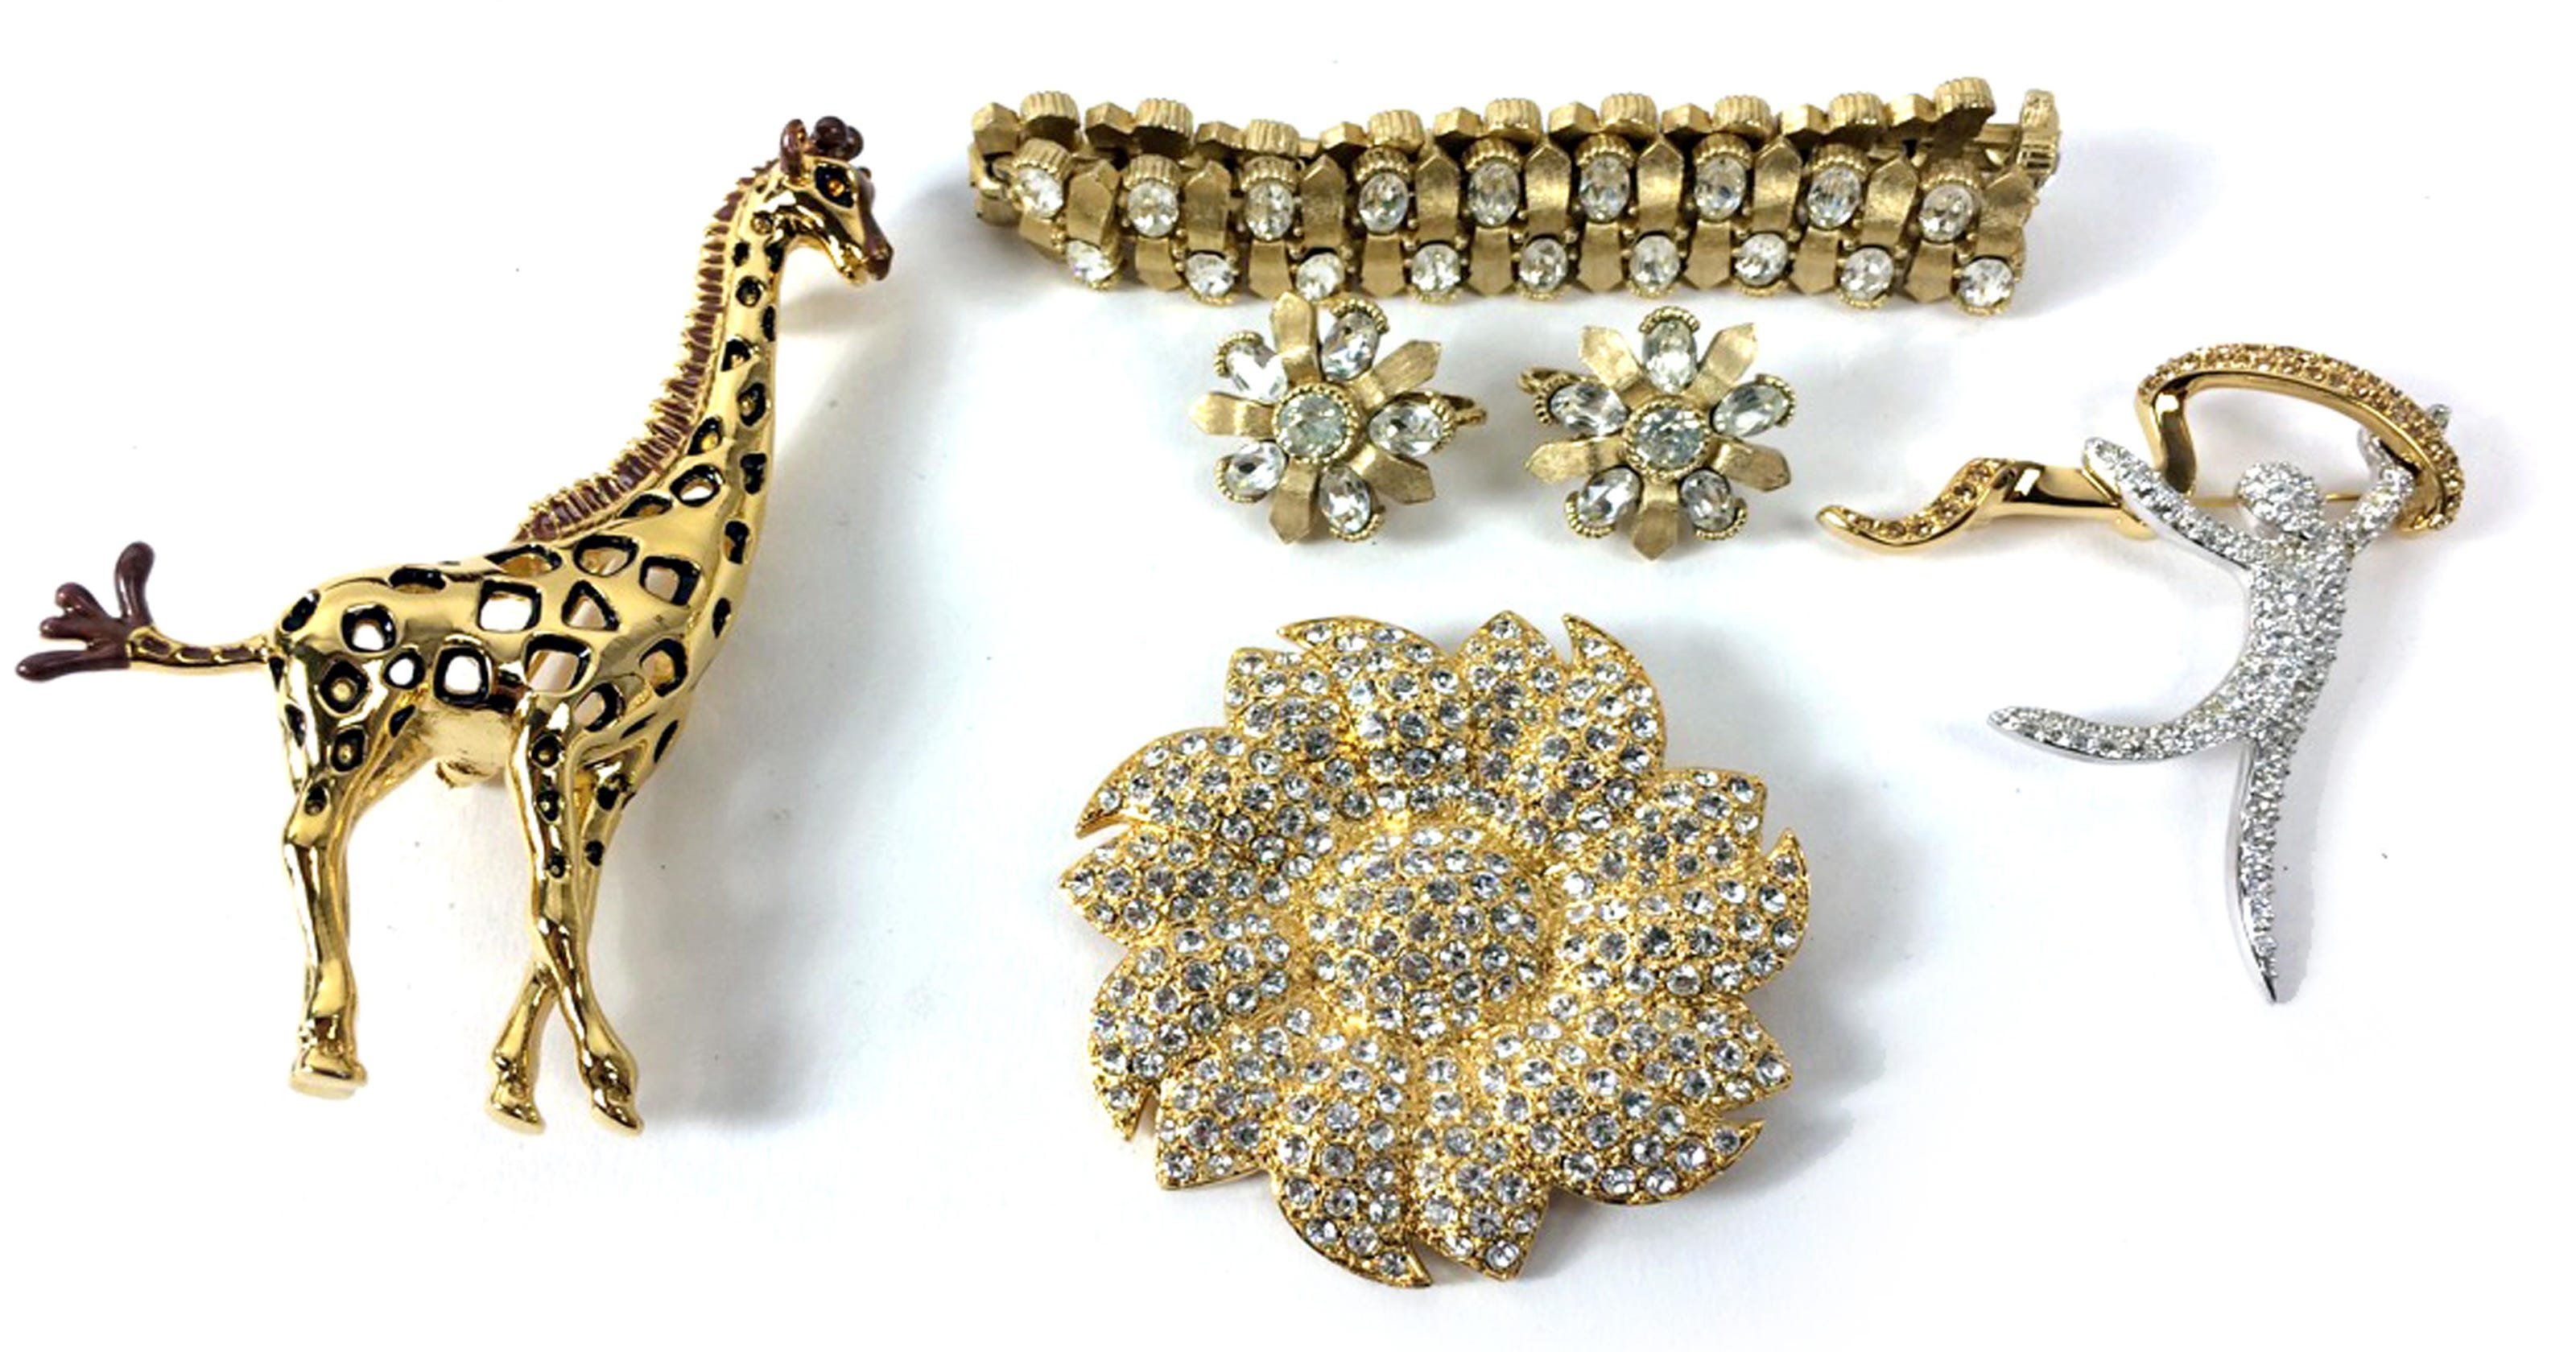 3 tips to determine value of costume jewelry